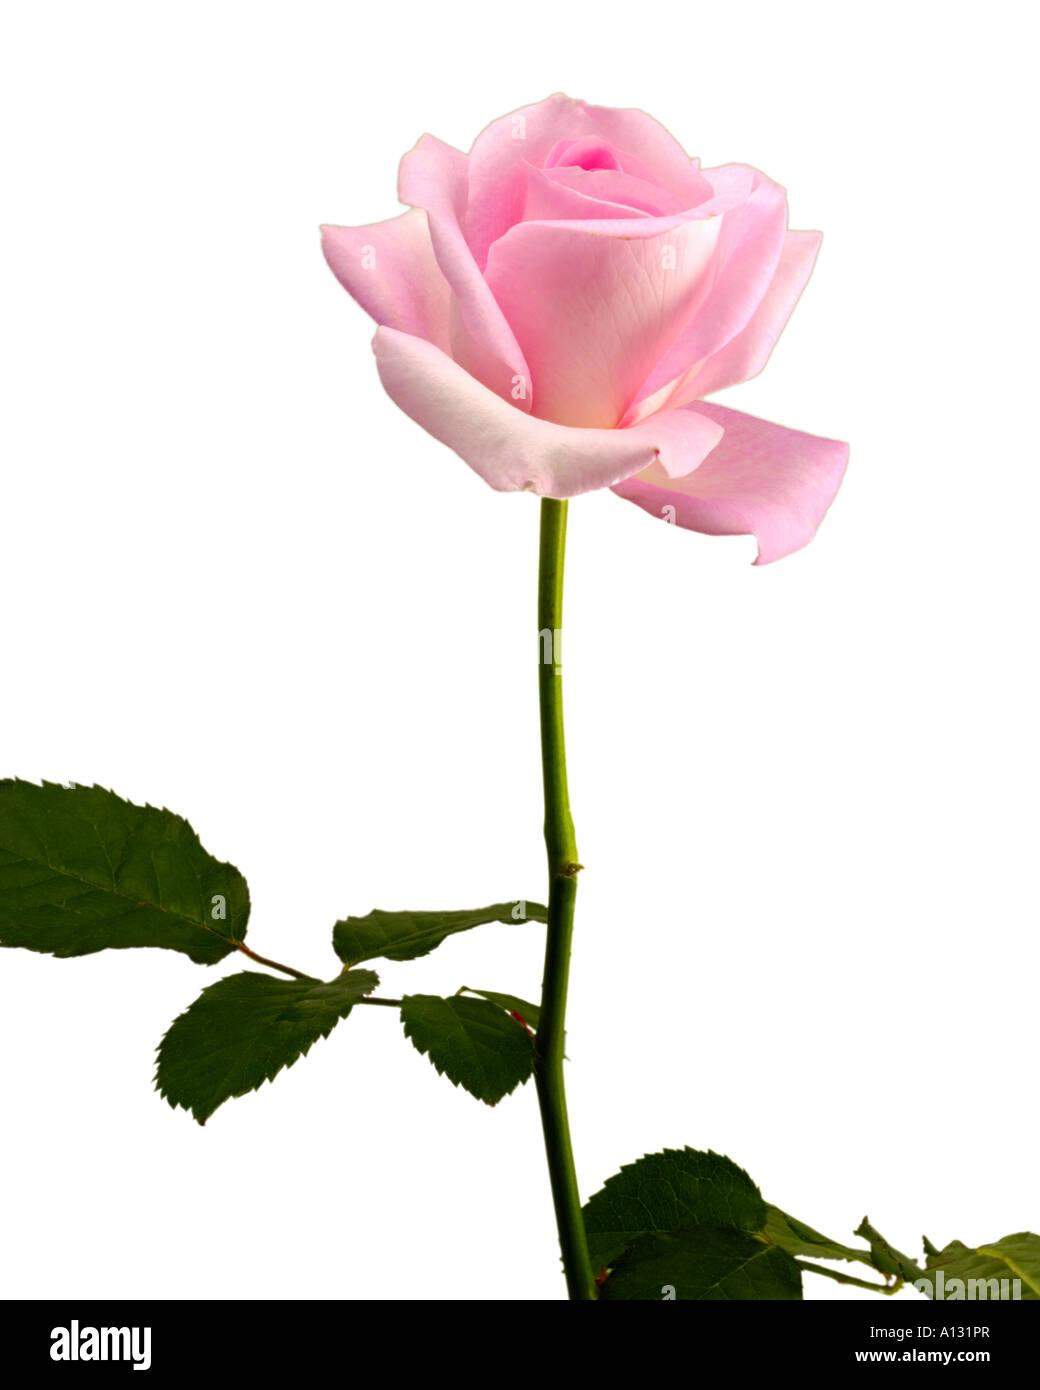 single pink rose on white background stock photo 10126750 alamy